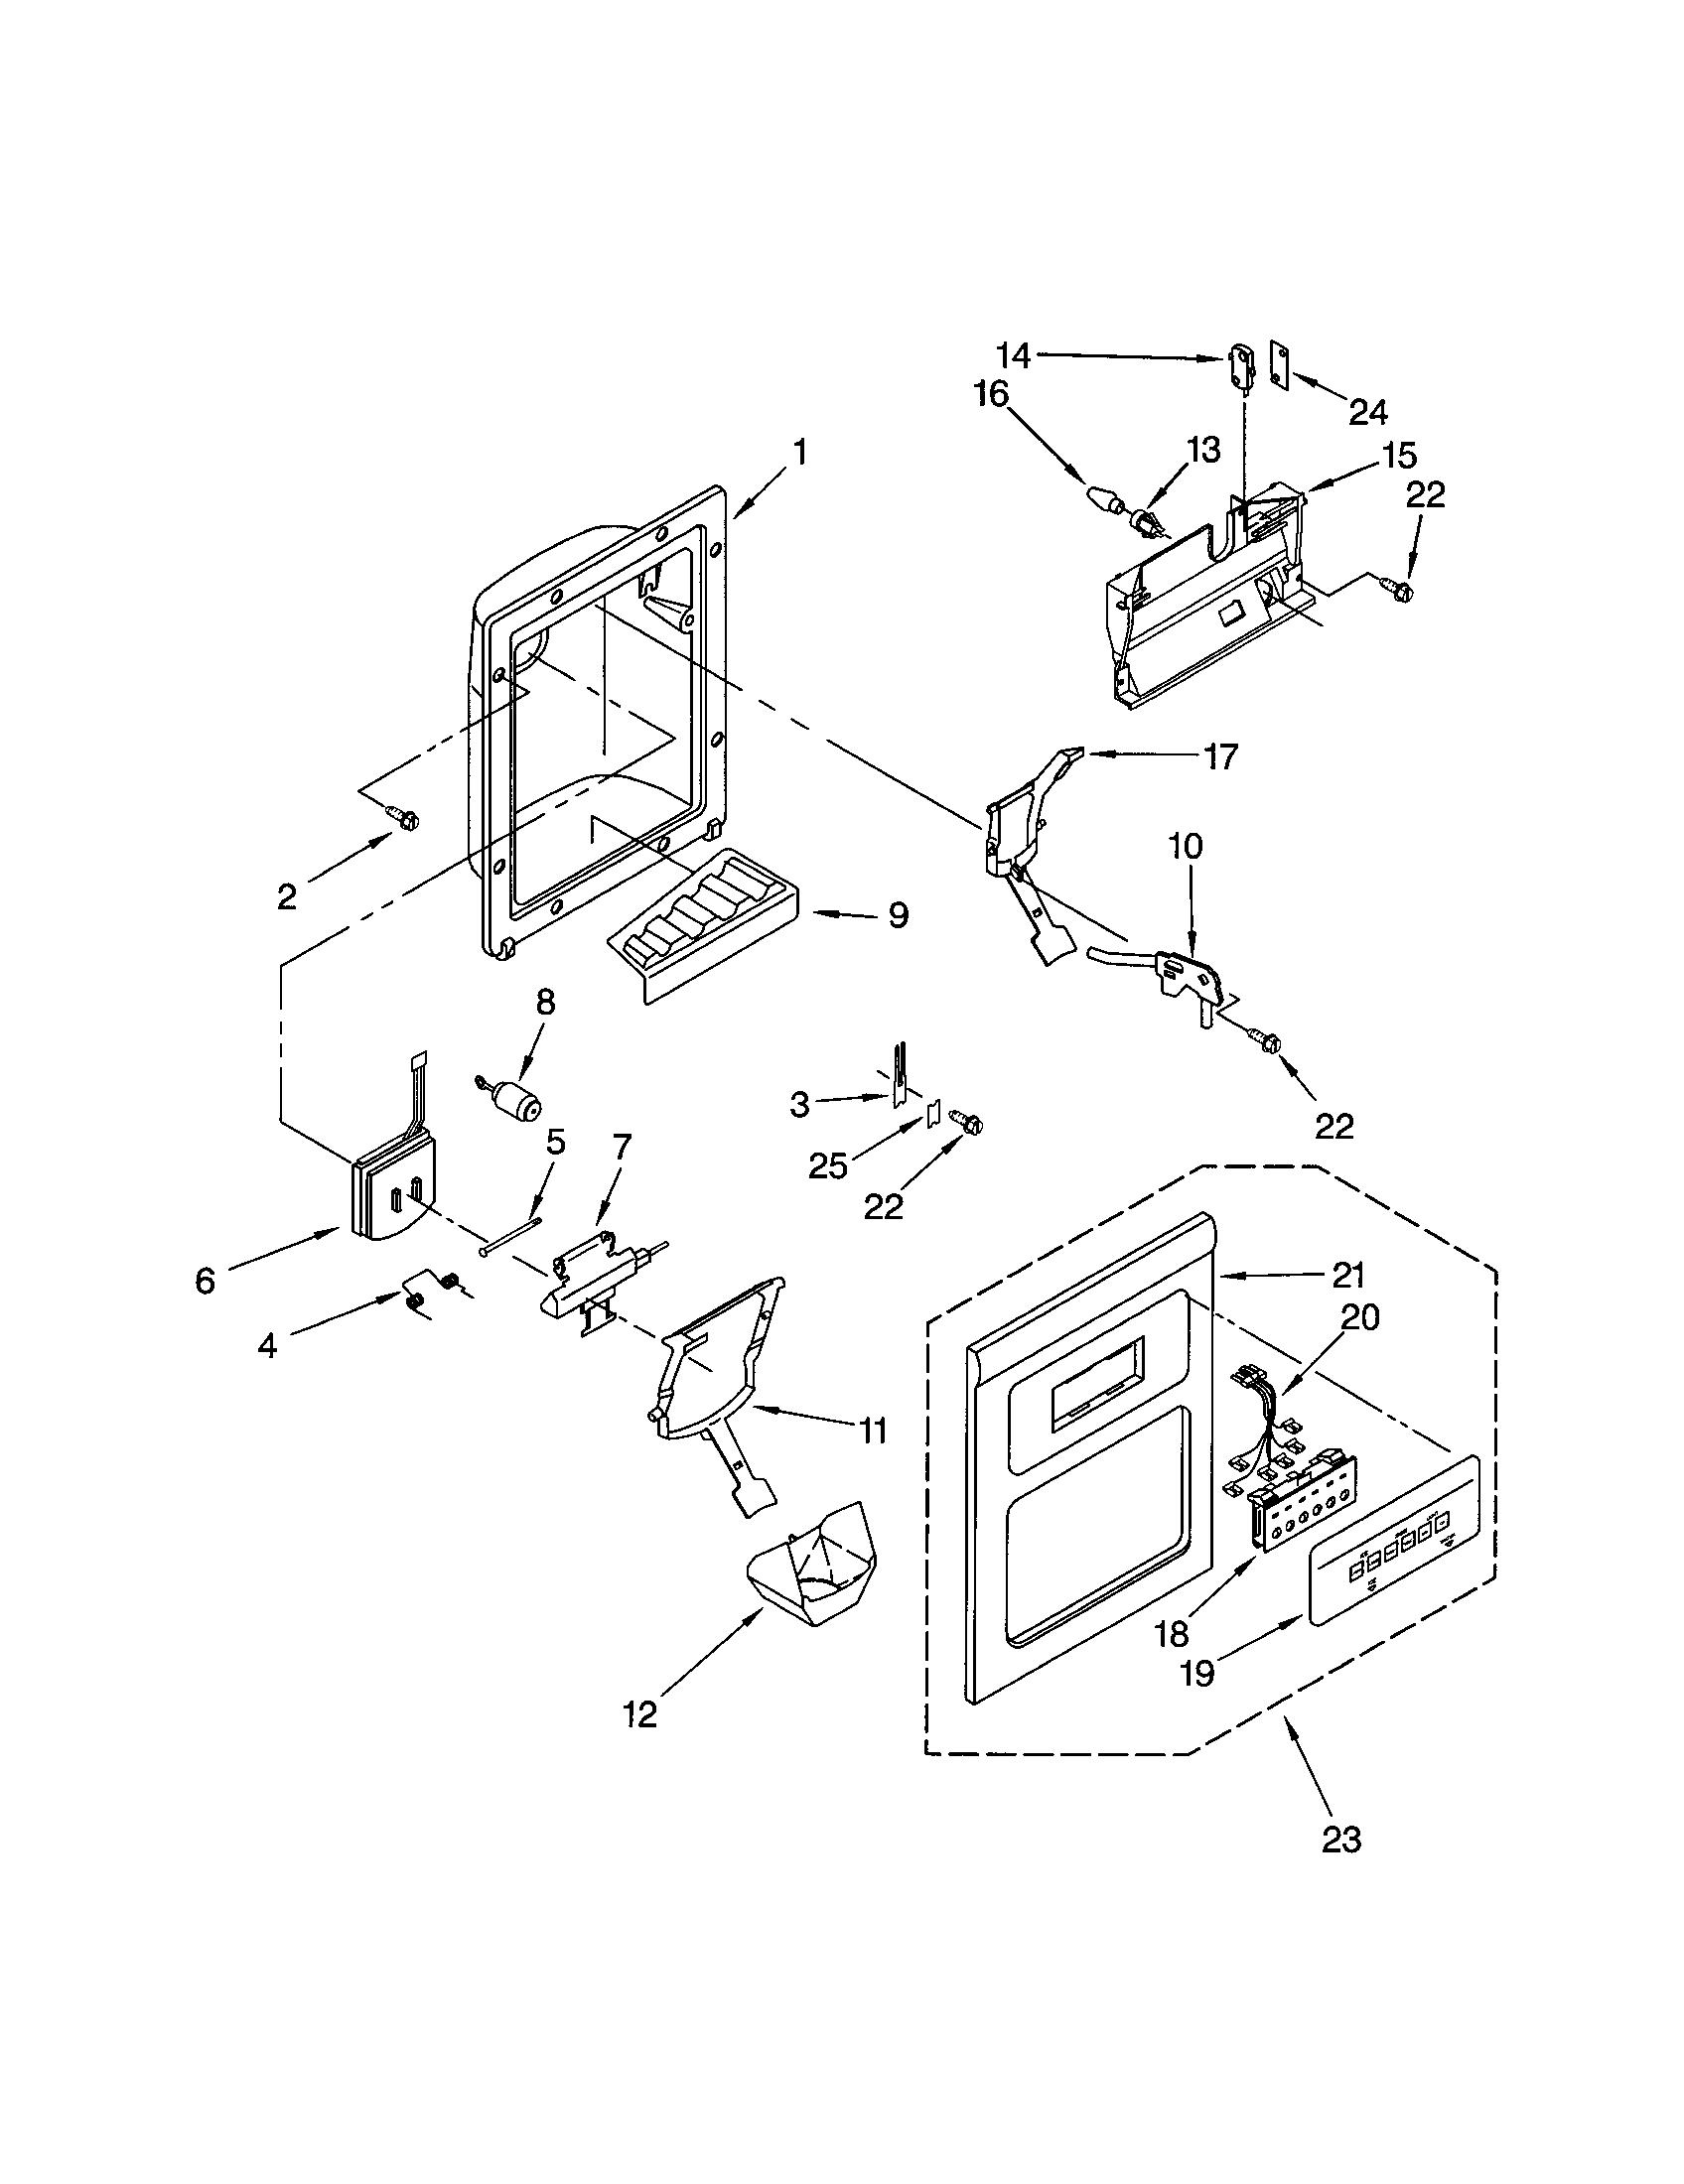 hight resolution of wiring diagram whirlpool refrigerator ice maker wiring frigidaire ice maker wiring diagram frigidaire discover your on